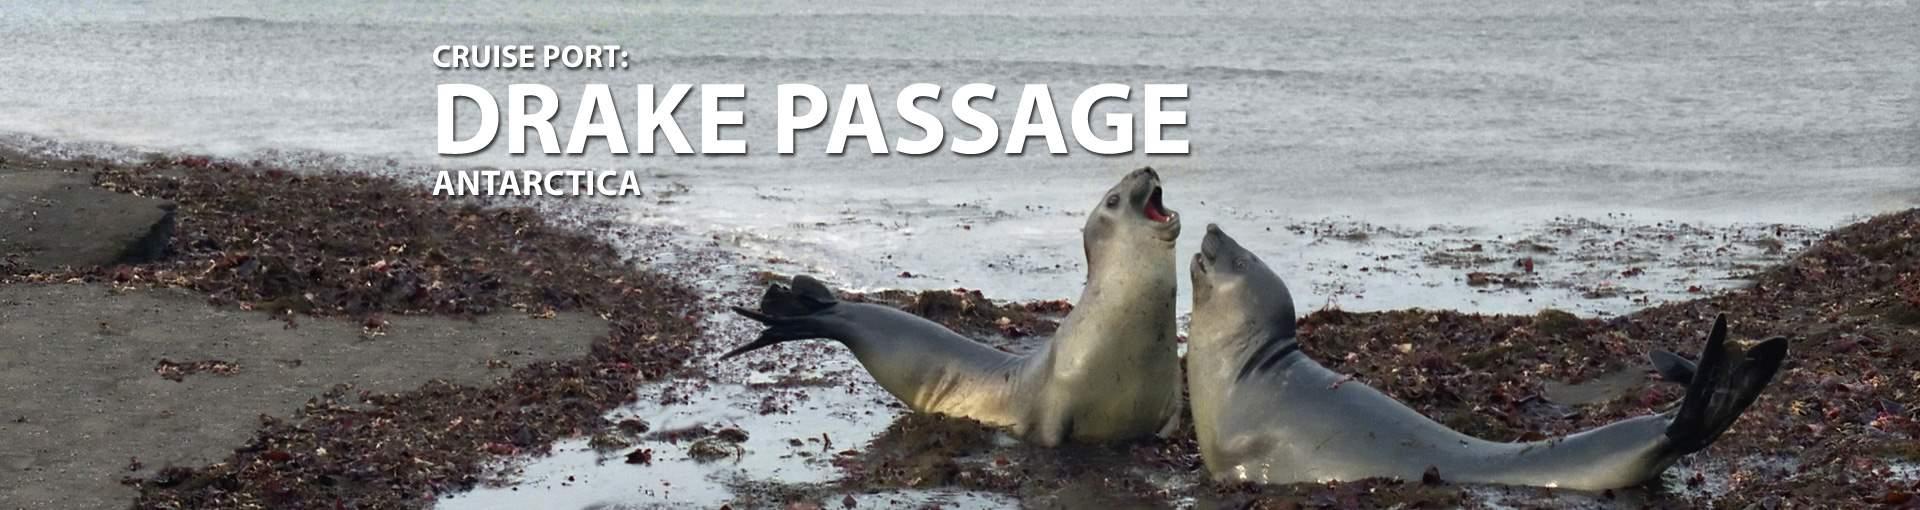 Cruises to Drake Passage, Antarctica